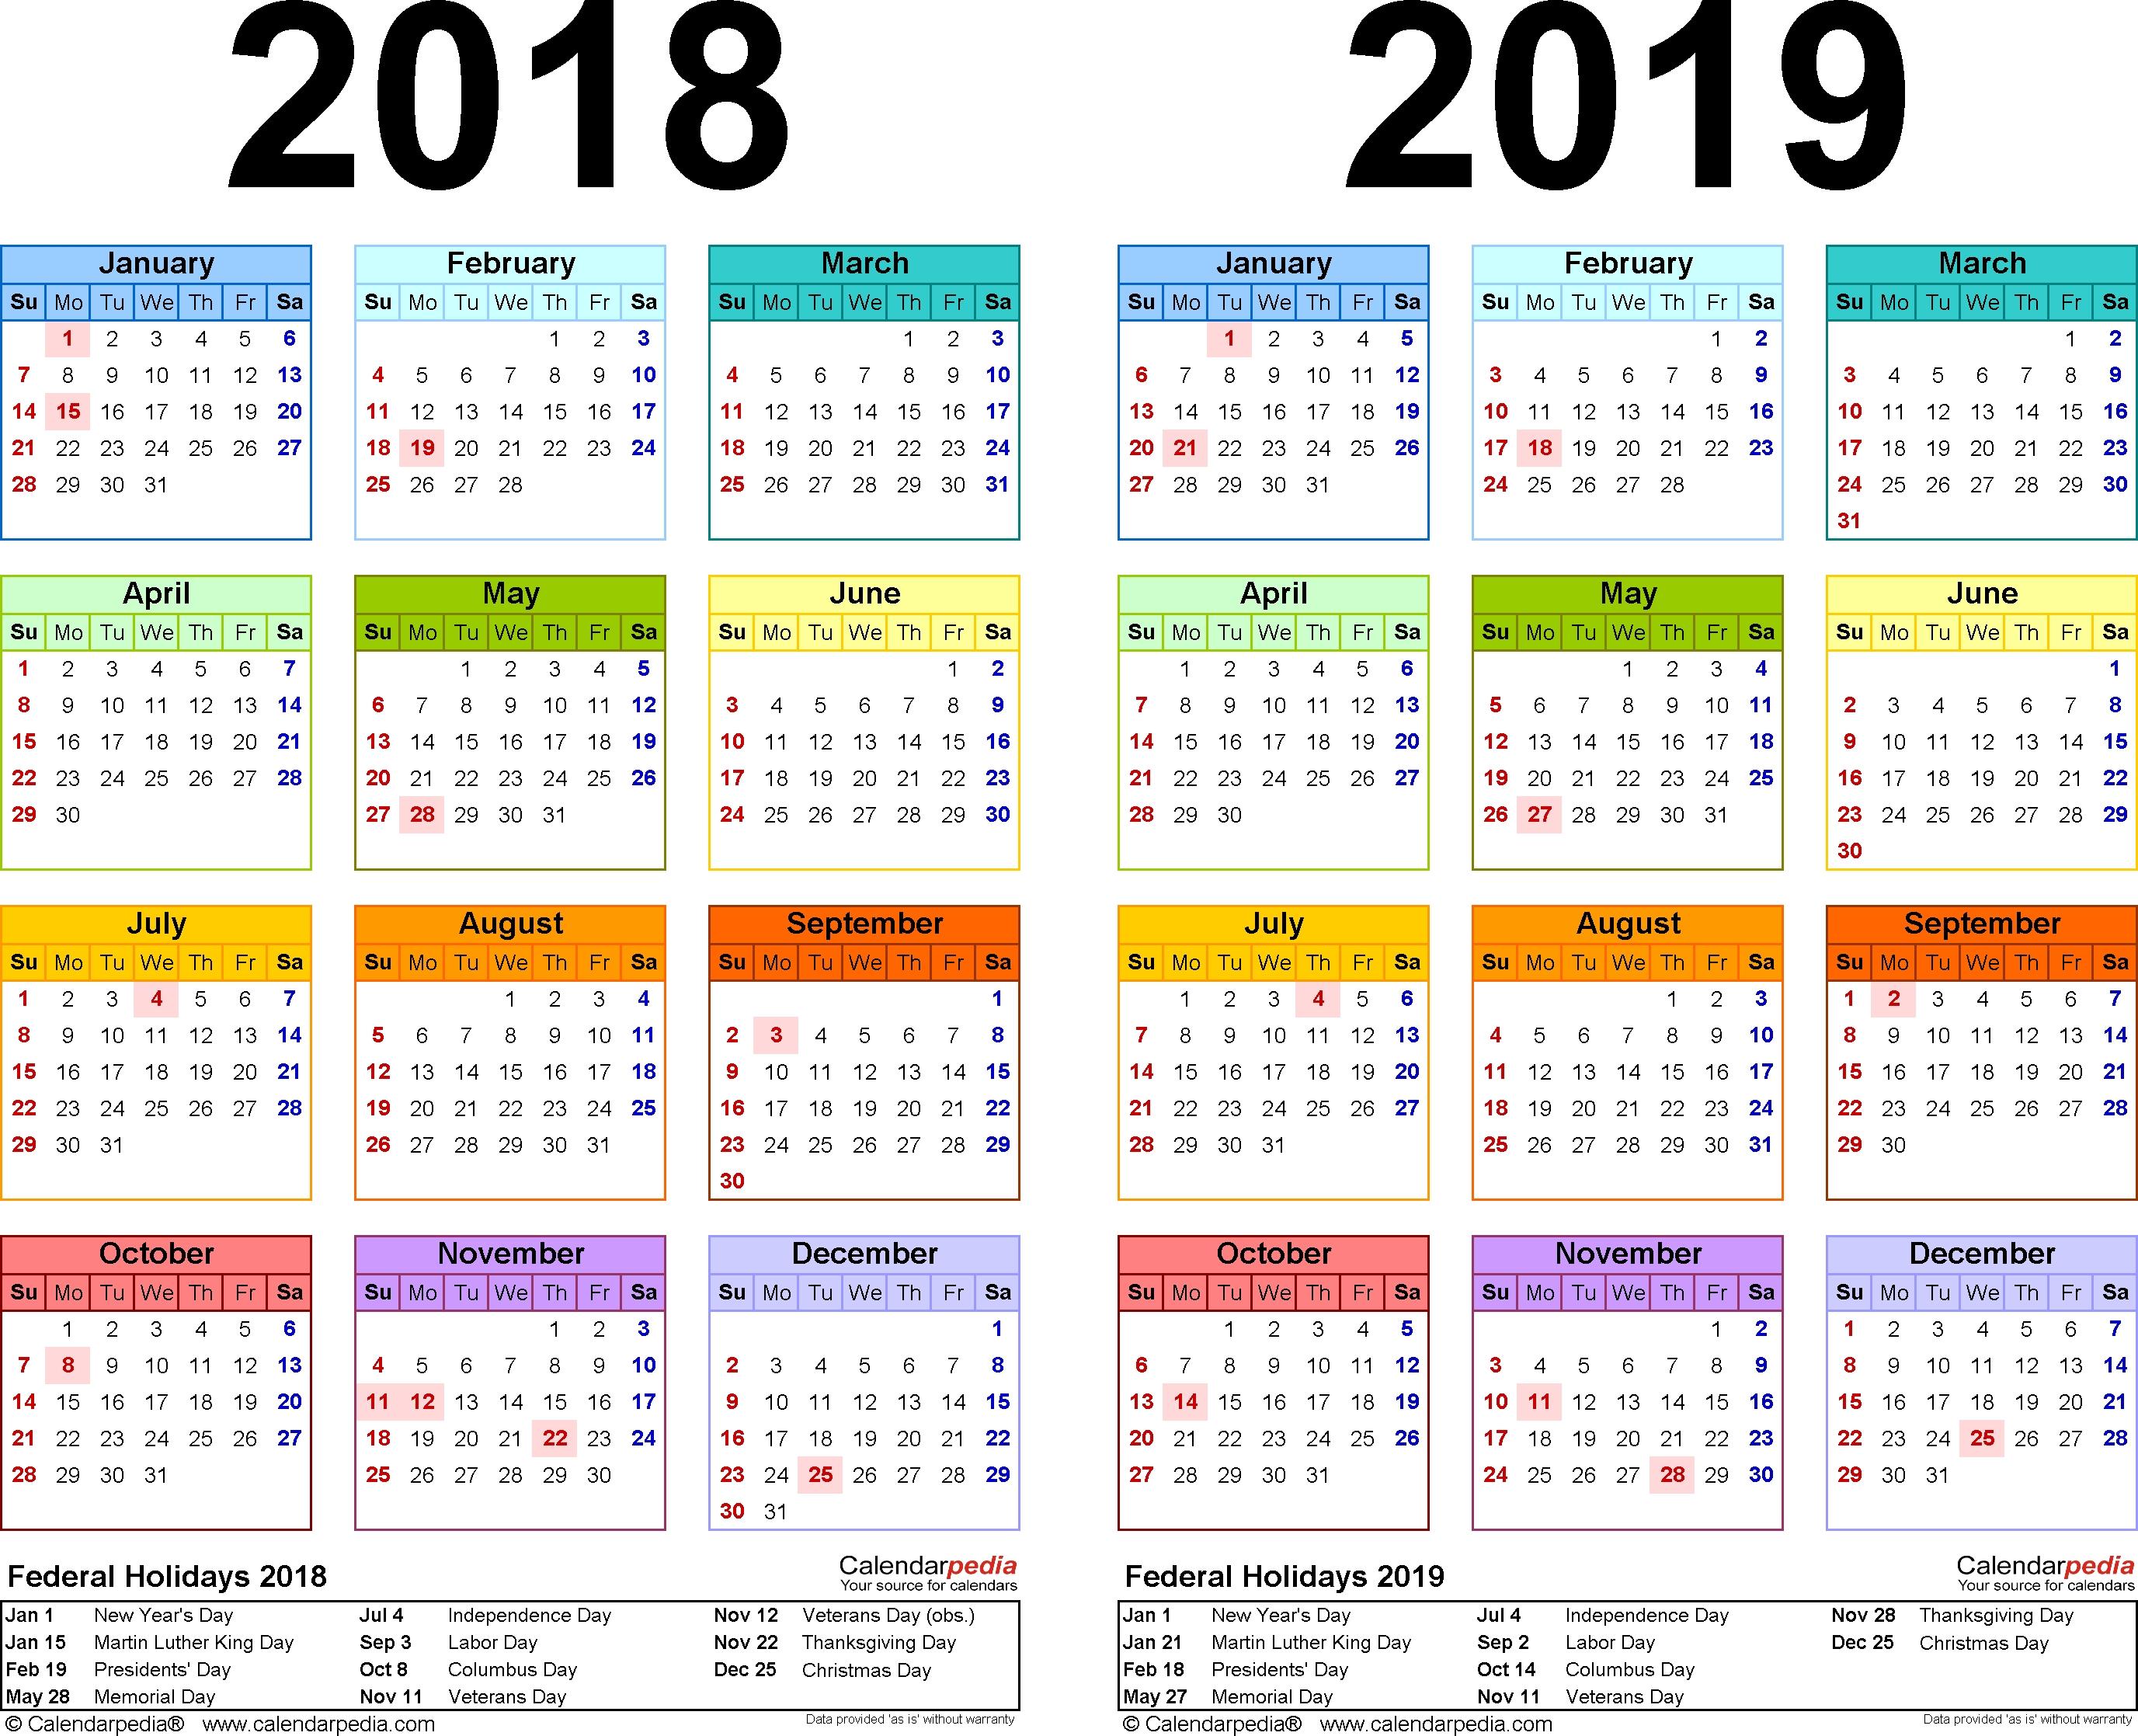 2018-2019 Calendar - Free Printable Two-Year Pdf Calendars with 3 Year Calendar Printable 2018 2019 2020